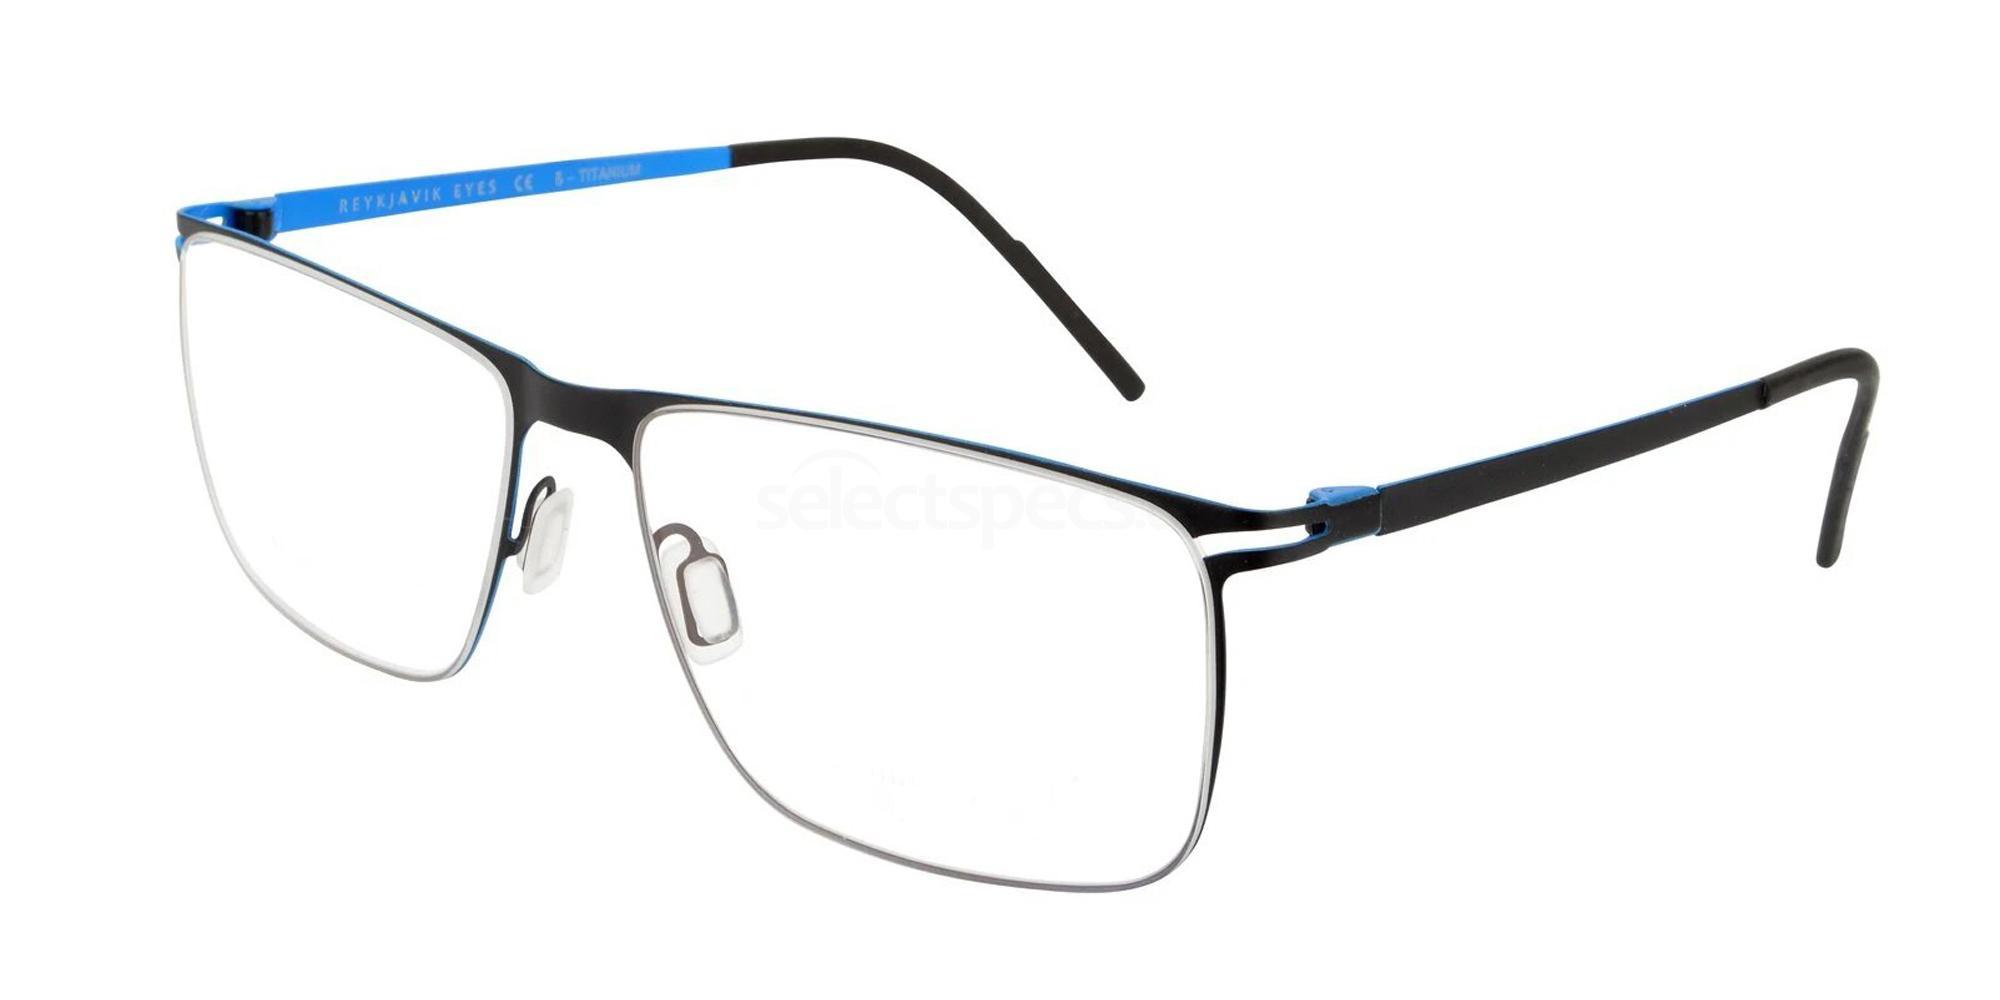 C1 ODIN Glasses, Reykjavik Eyes Black Label